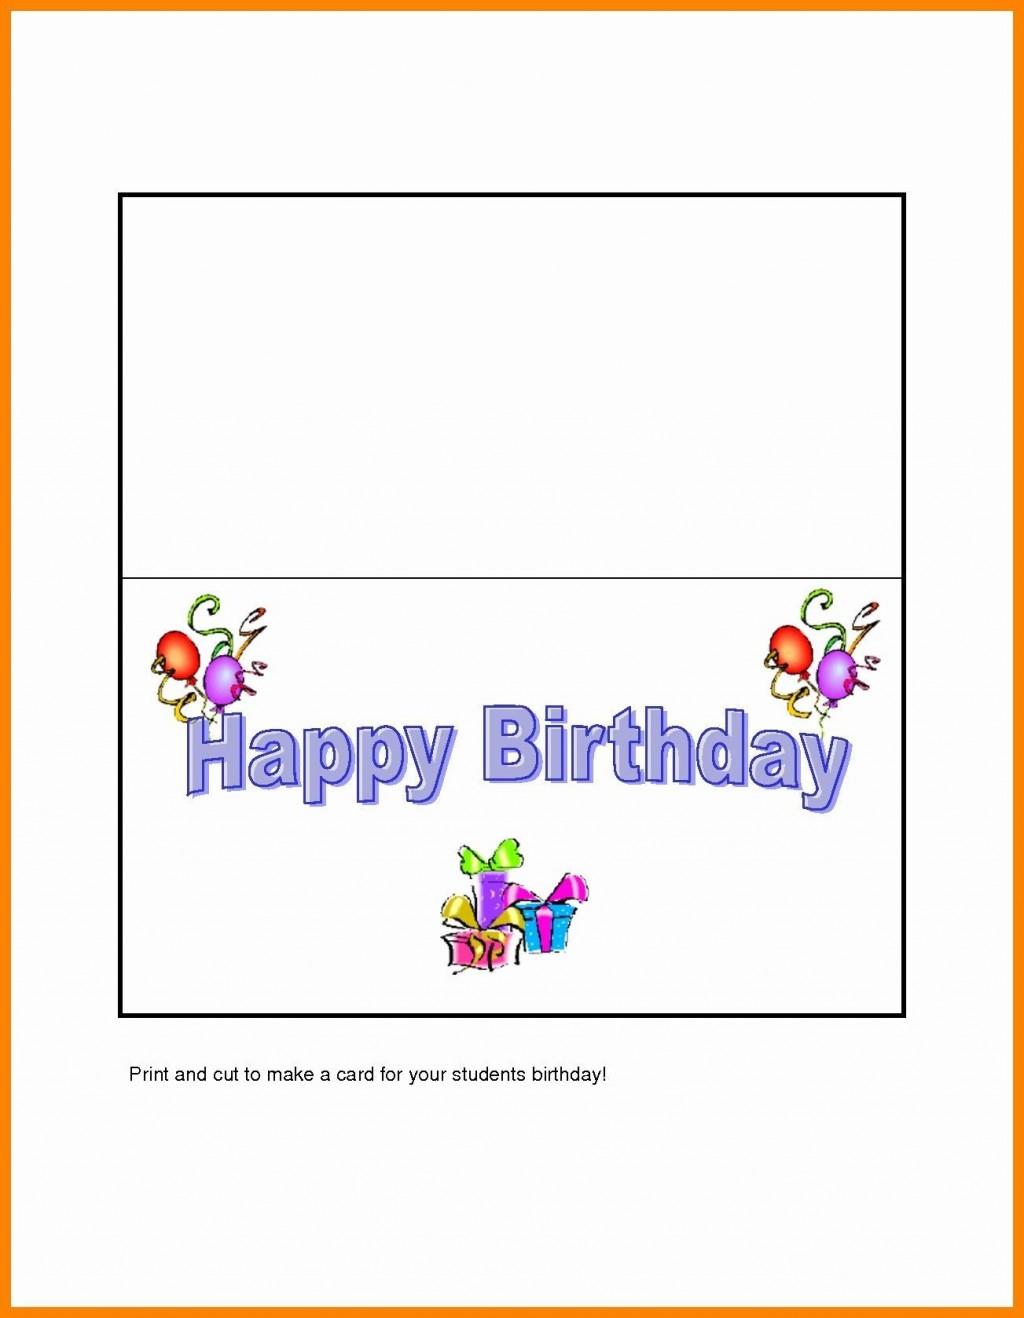 004 Rare Birthday Card Template Word Quarter Fold High Def Large